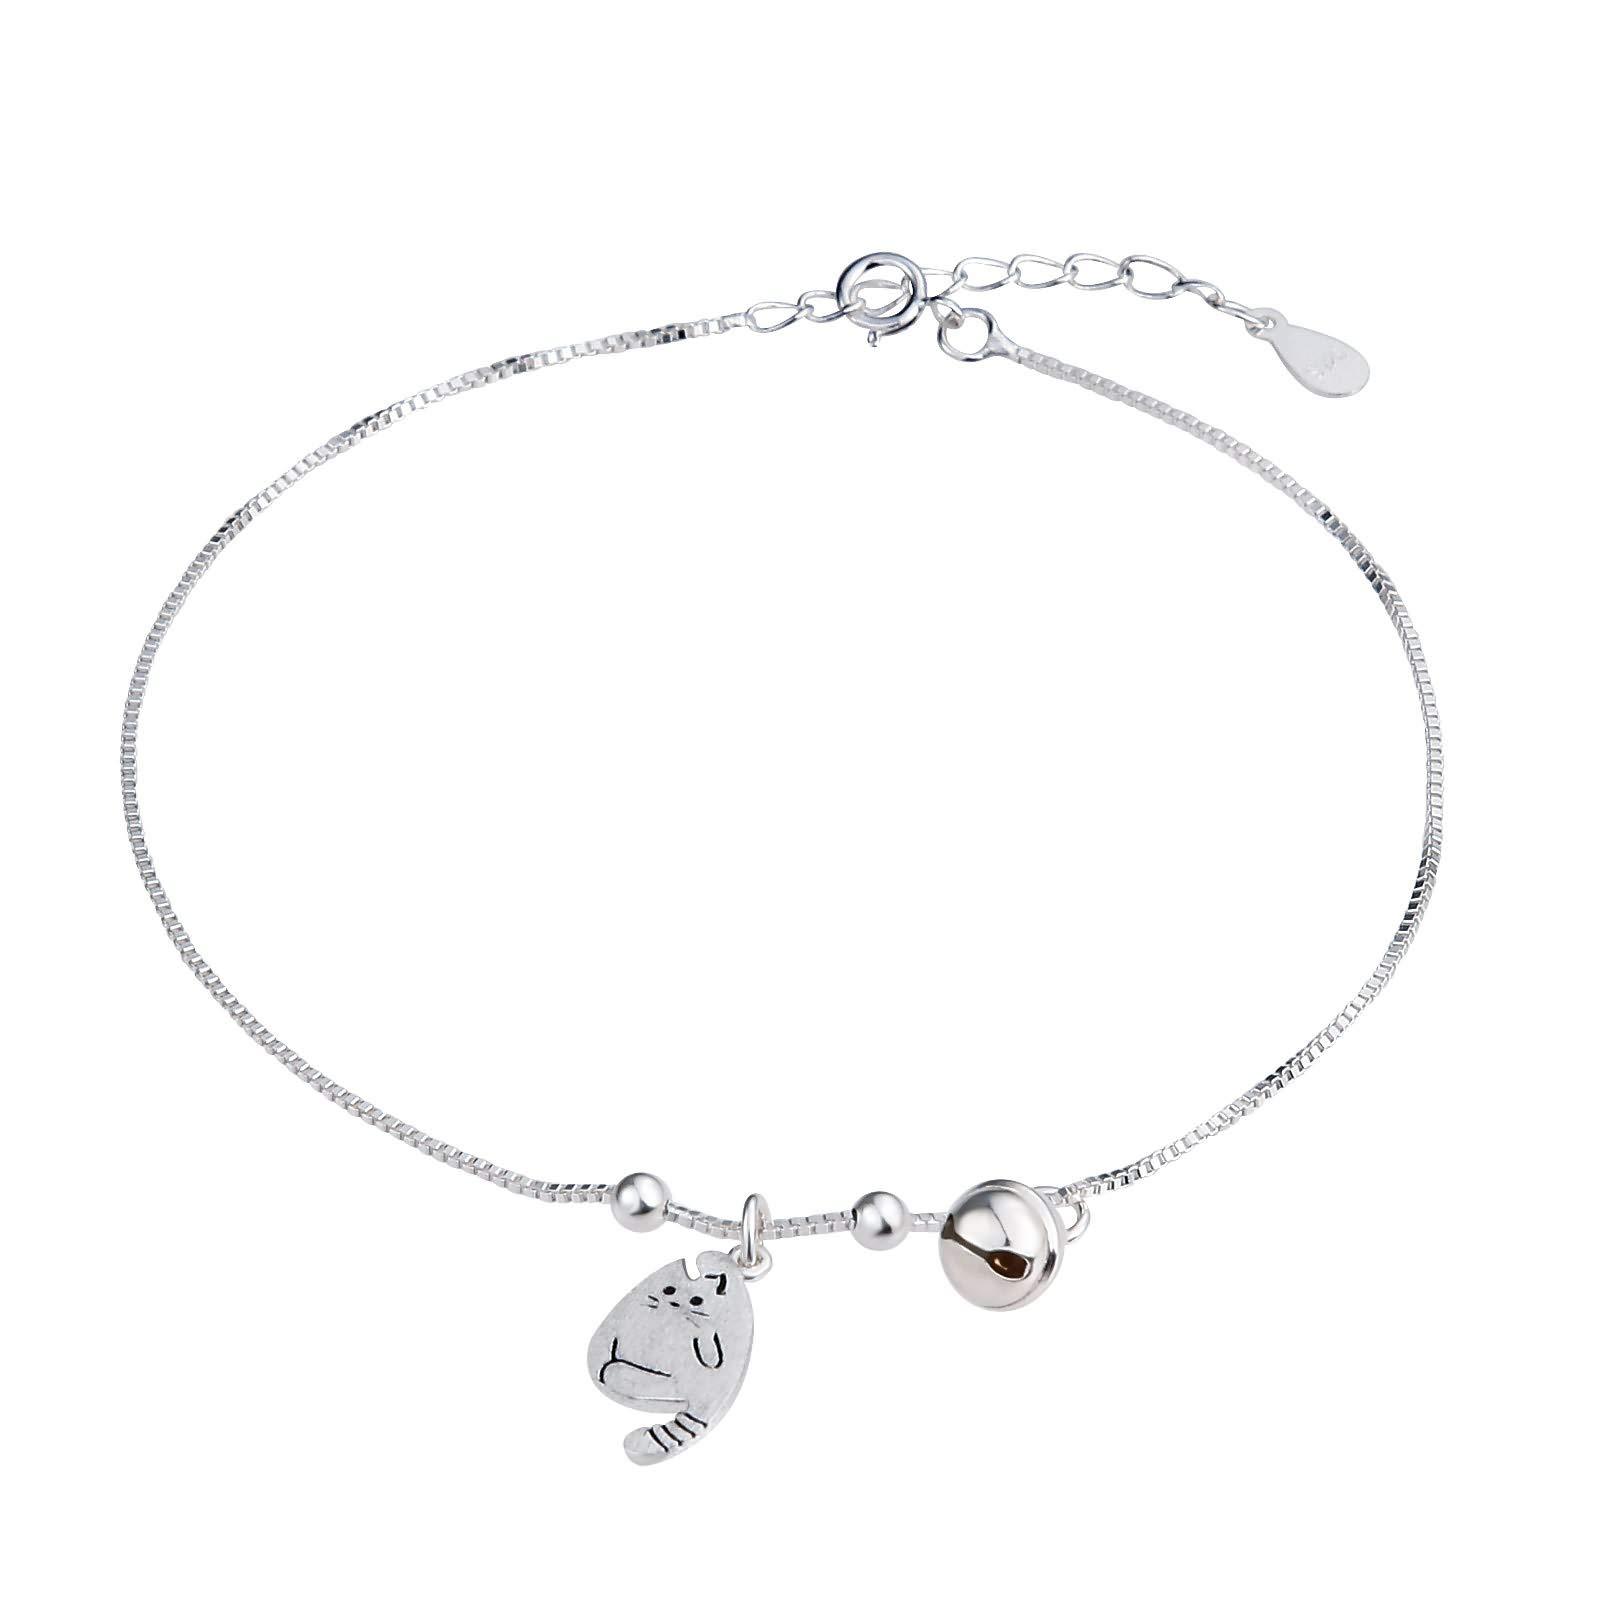 Beydodo Ankle Bracelet Sterling Silver Bells Beach Foot Jewelry Wedding Cat and Bells Charms